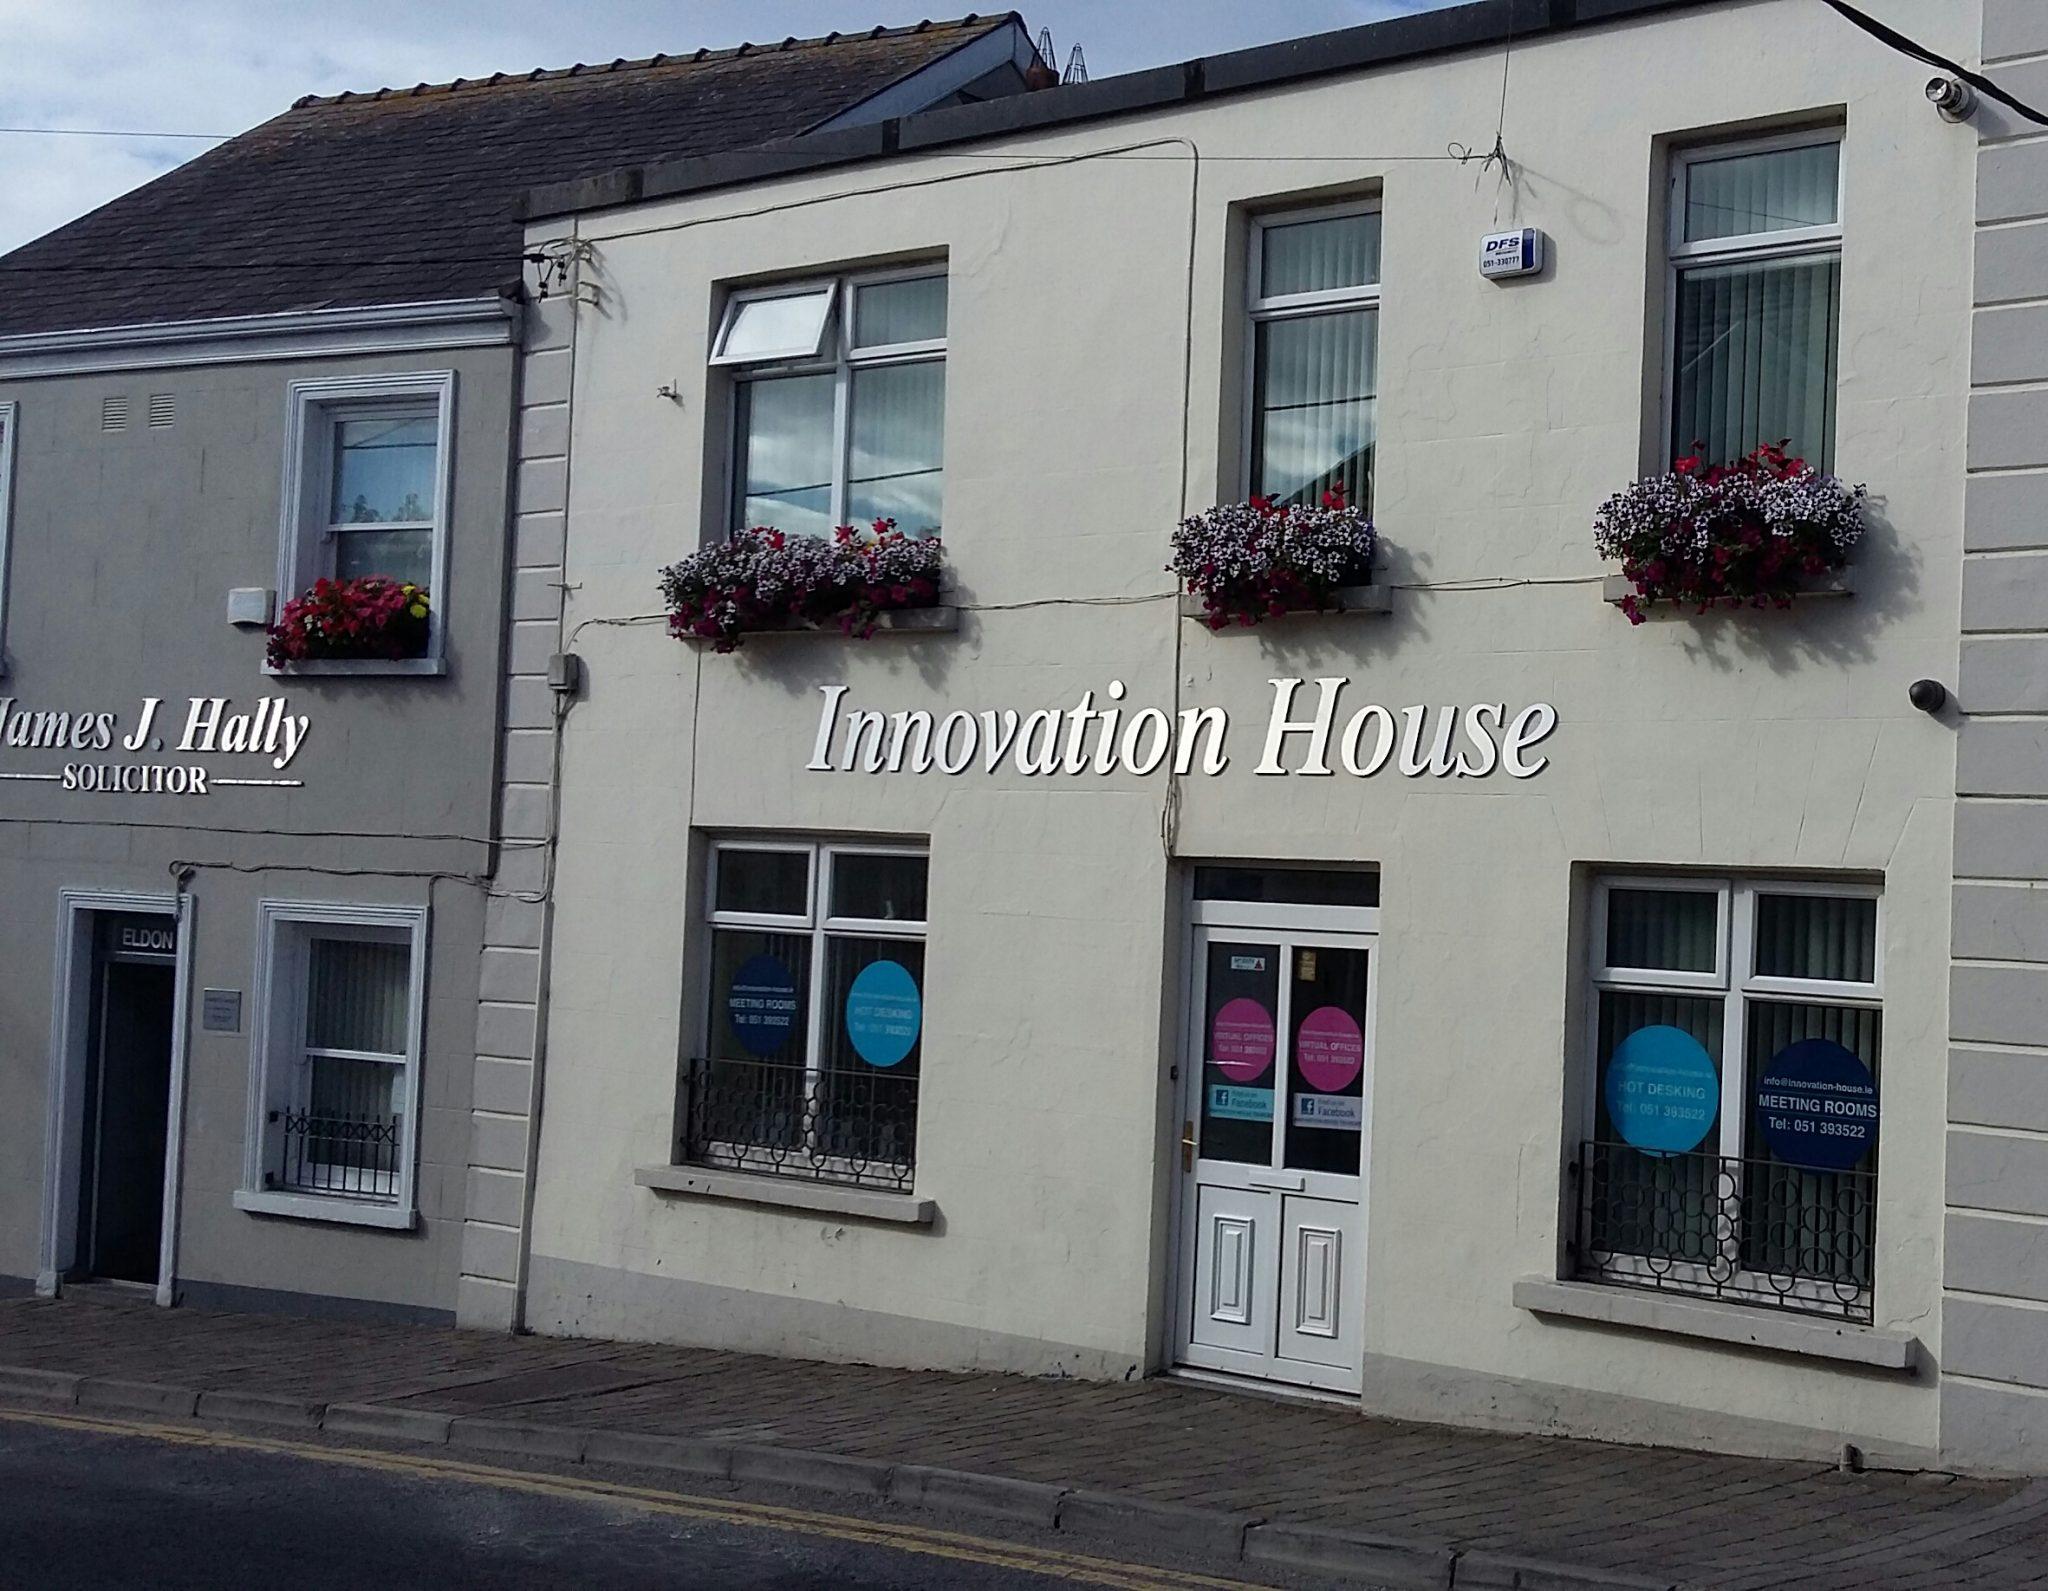 Innovation House